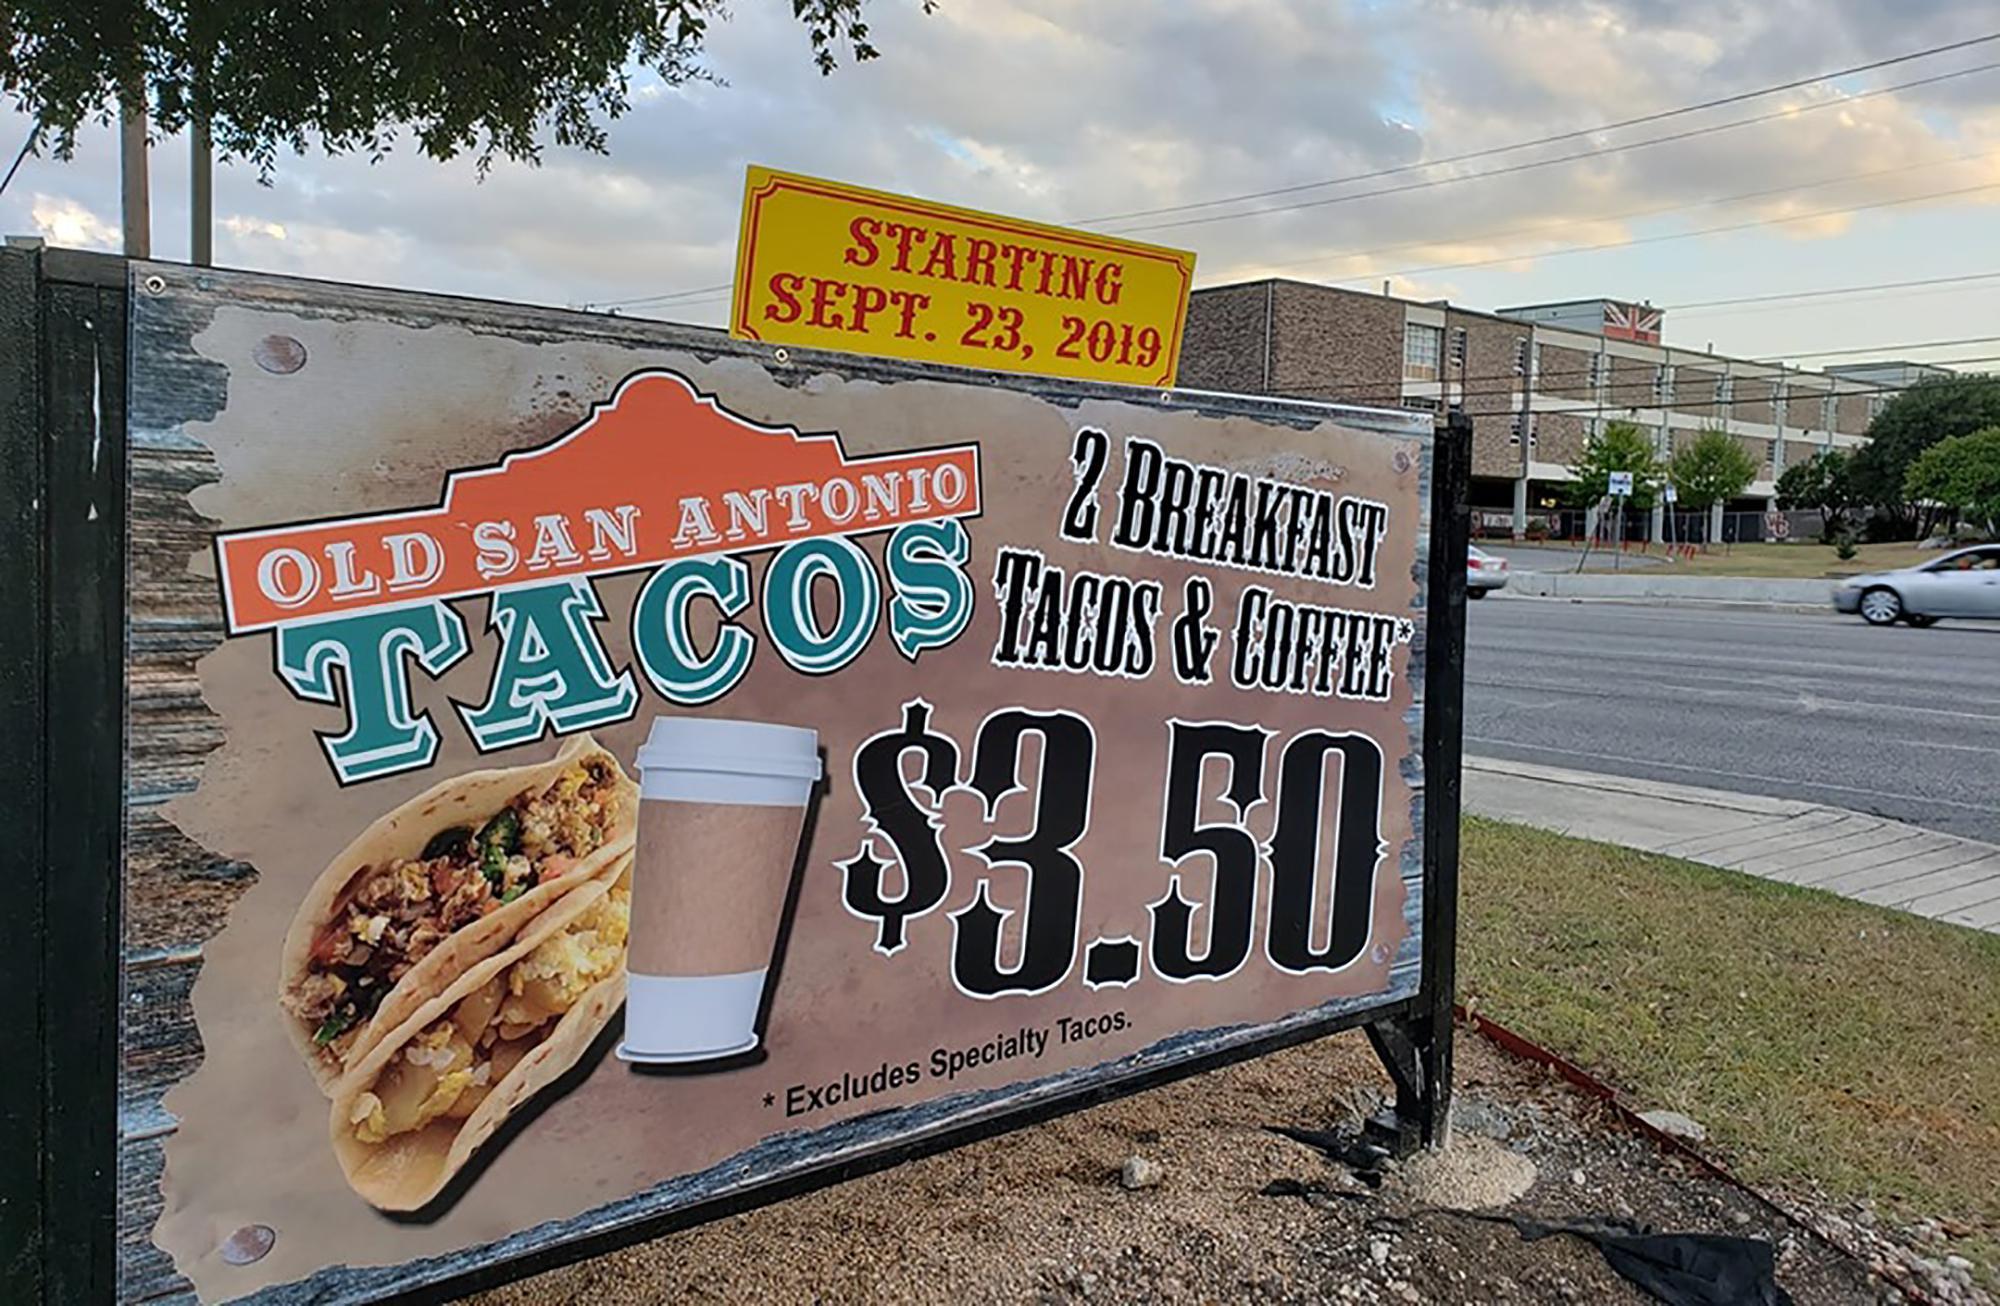 Quickdraw BBQ adds breakfast tacos by San Antonio's Churchill High School